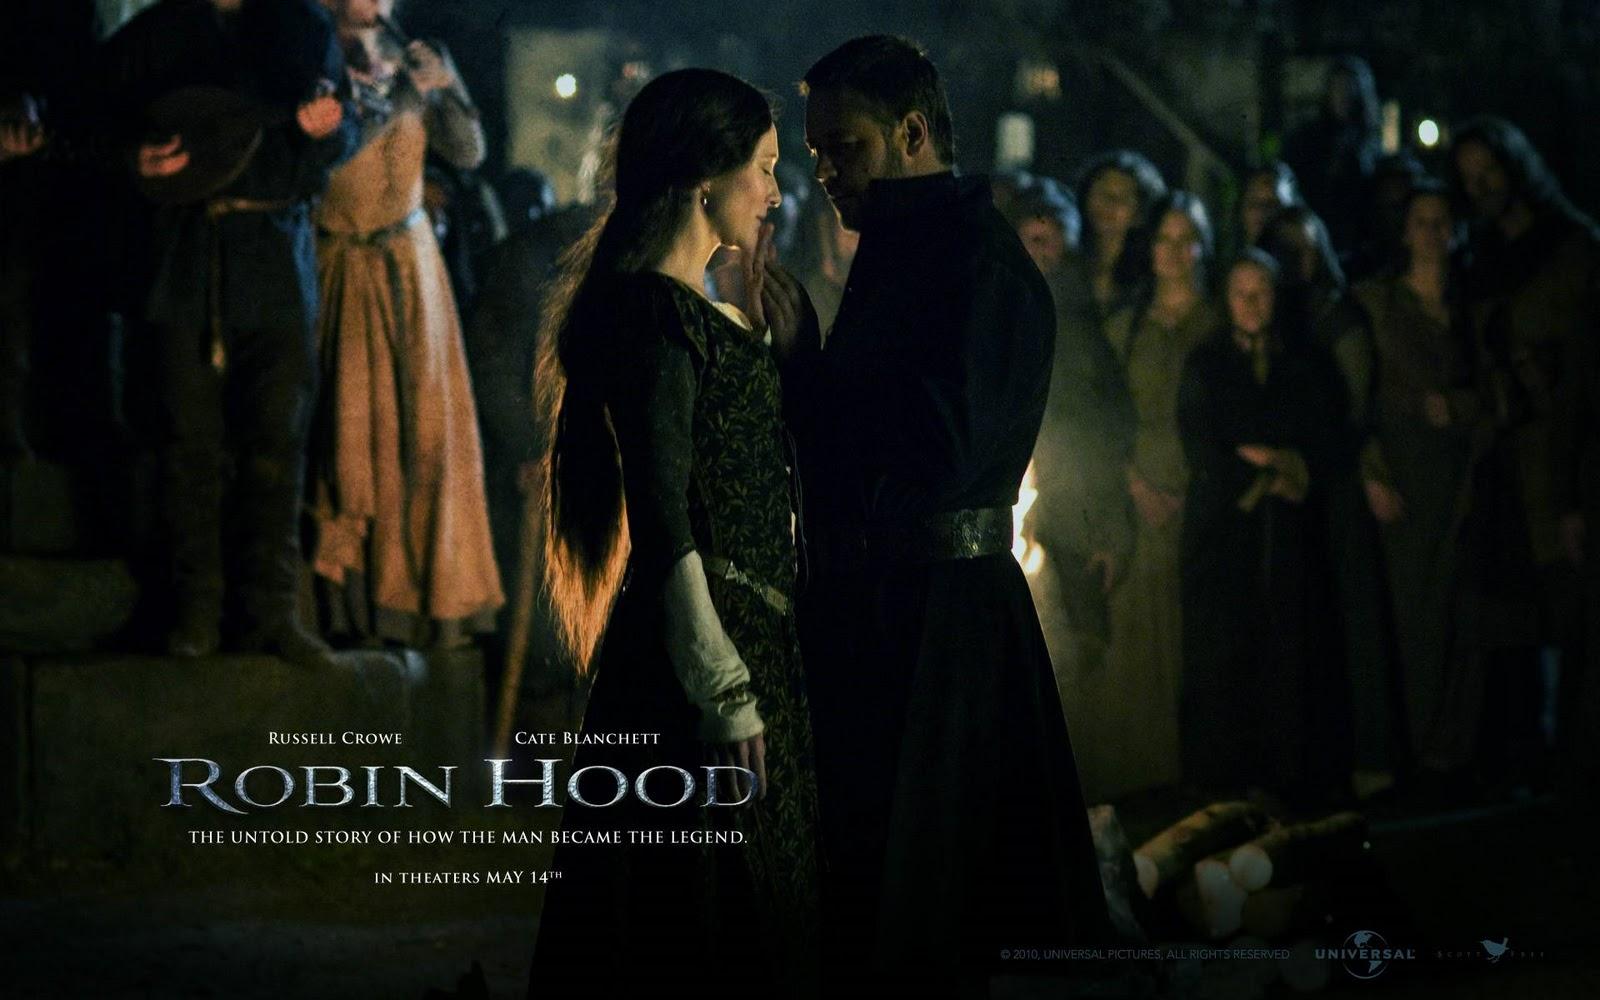 http://4.bp.blogspot.com/_GYSLJQvBMqg/S_NvkyF-niI/AAAAAAAABR8/YkbJC9uMfT0/s1600/2010_robin_hood_wallpaper_004.jpg